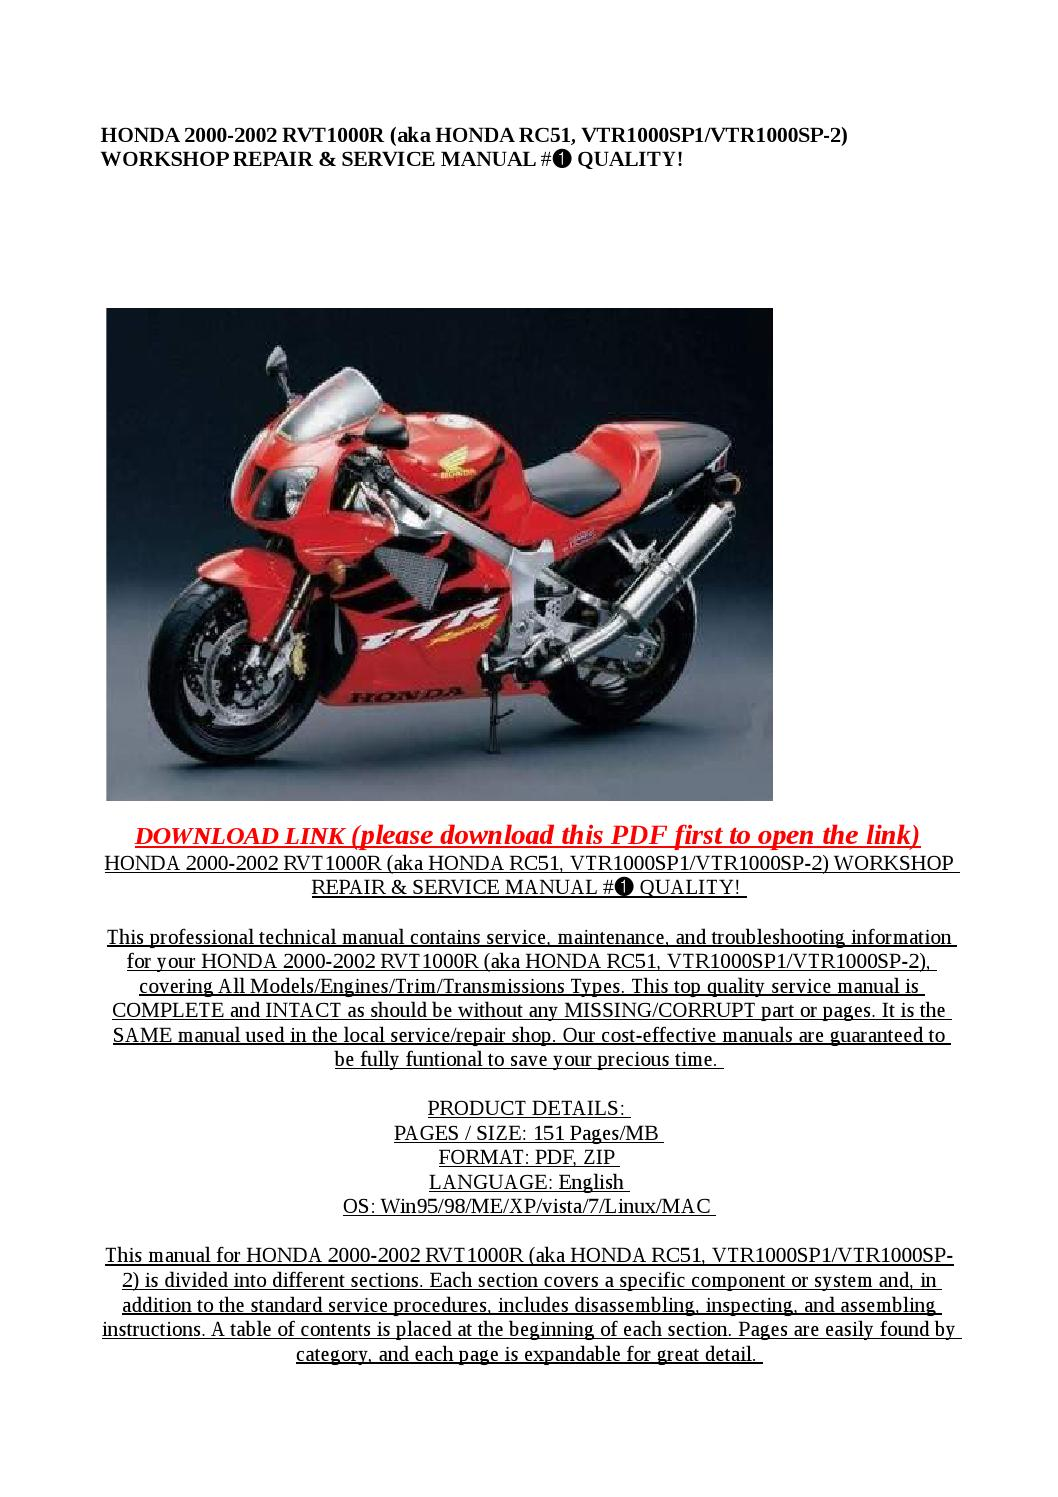 Honda 2000 2002 rvt1000r (aka honda rc51, vtr1000sp1 vtr1000sp 2) workshop  repair & service manual # by Mary Jane - issuu